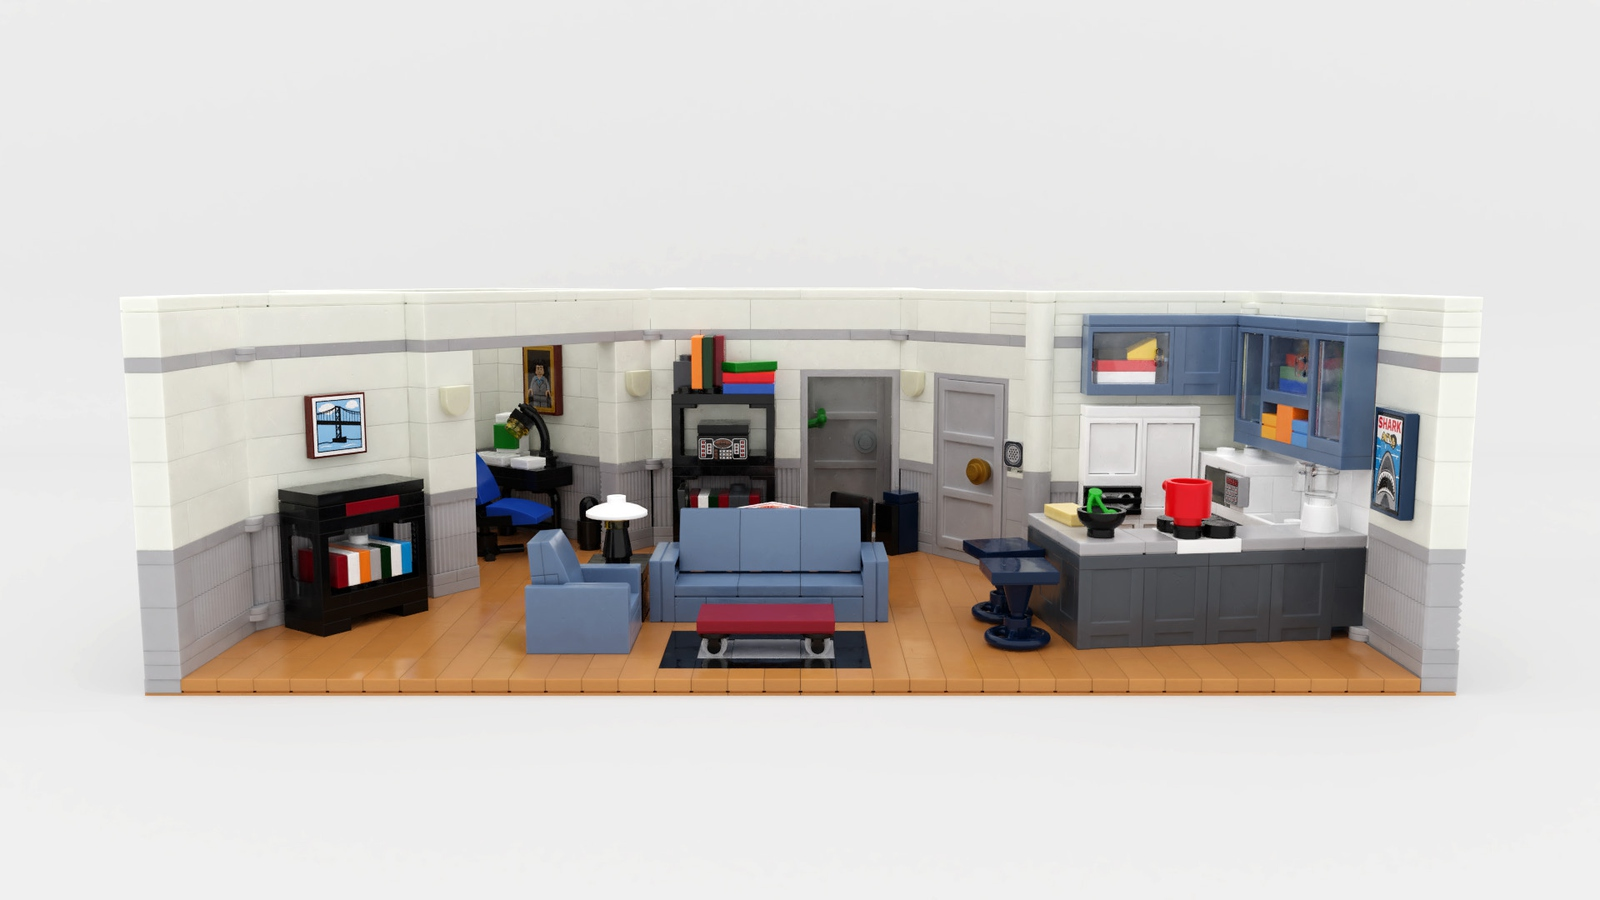 lego-ideas-seinfeld-30th-anniversary-couch-front-brent-waller zusammengebaut.com